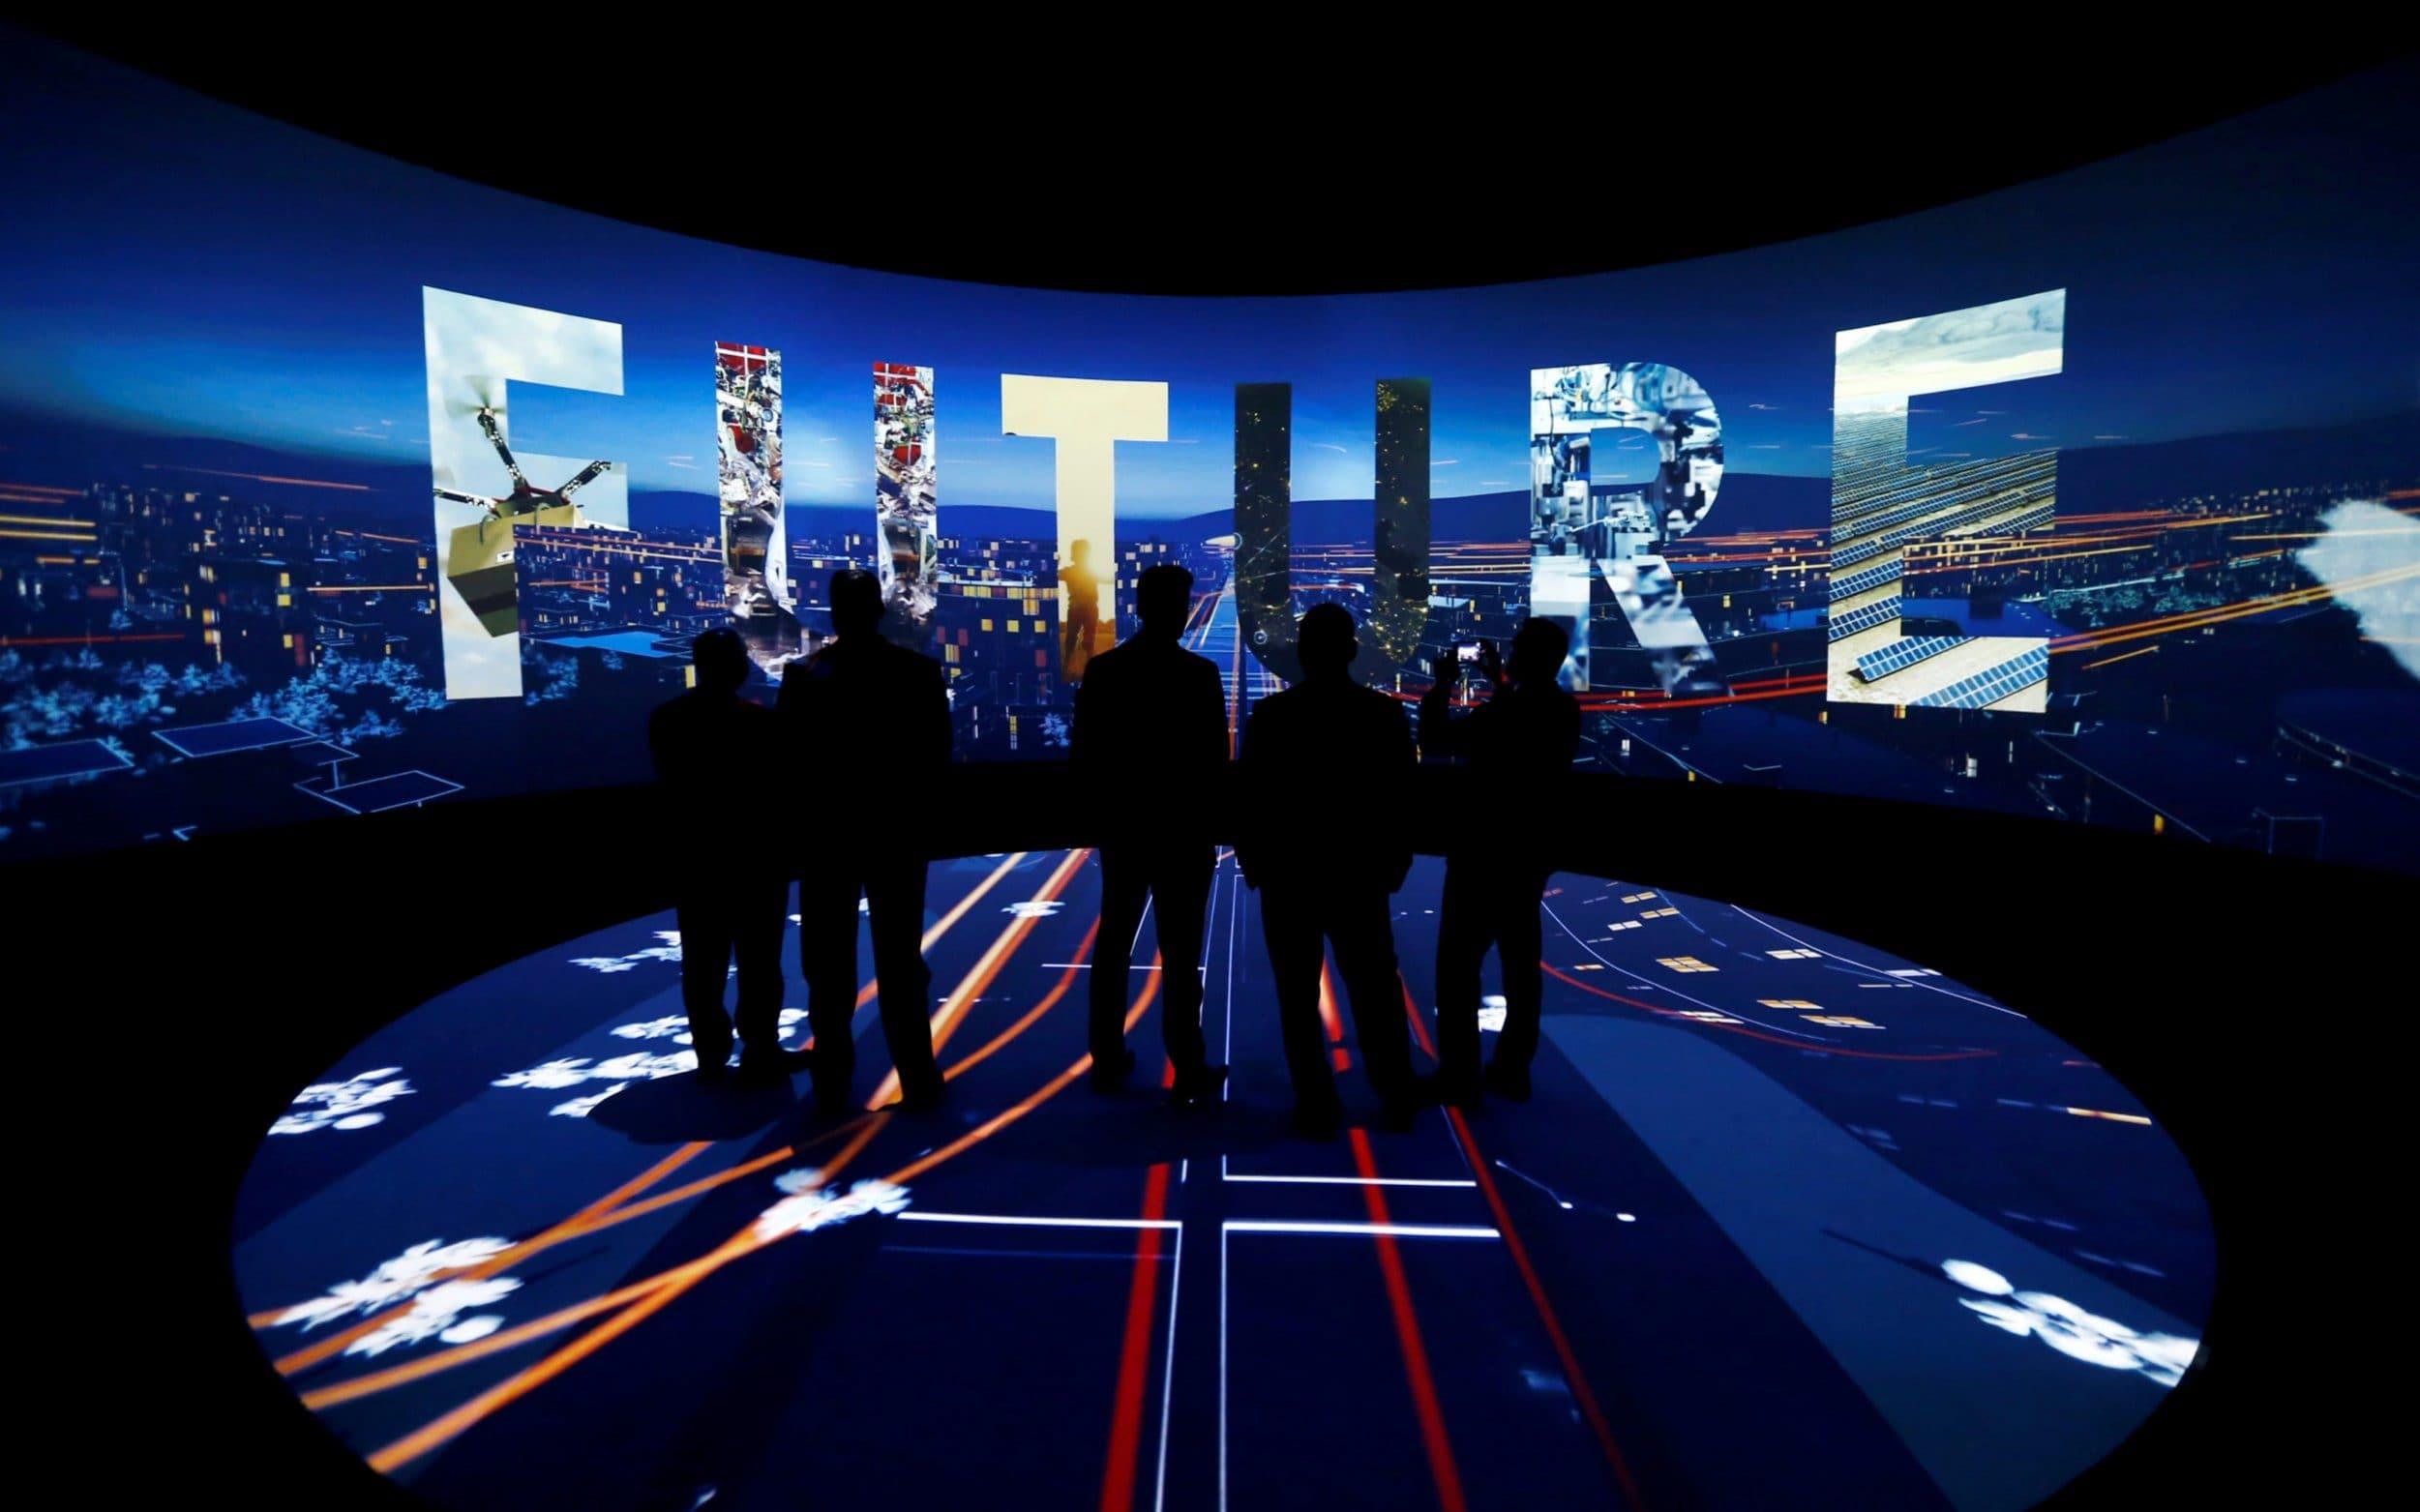 Saudi Arabia plans futuristic desert city with robot maids, neon beaches - and alcohol